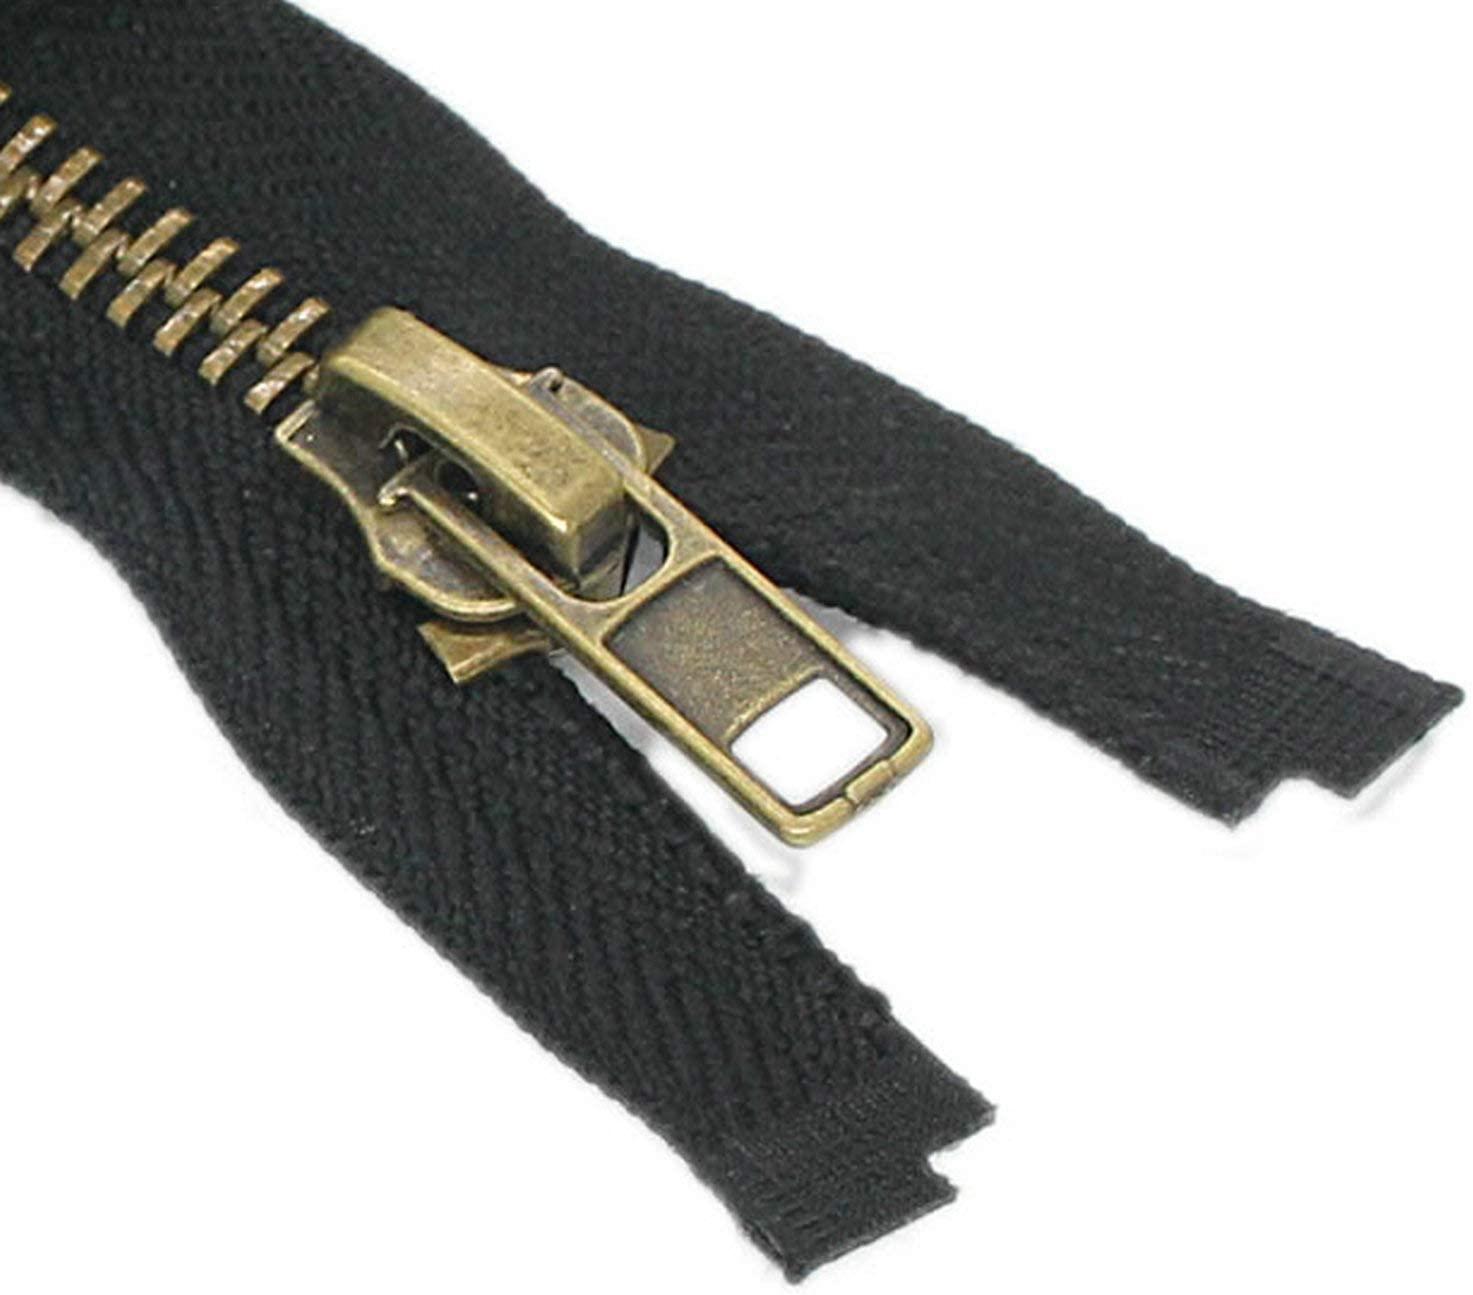 #8 40 Inch Antique Brass Zippers for Jackets 101.6cm Sewing Coats Crafts Separating Jacket Zipper Metal Zipper Heavy Duty (40